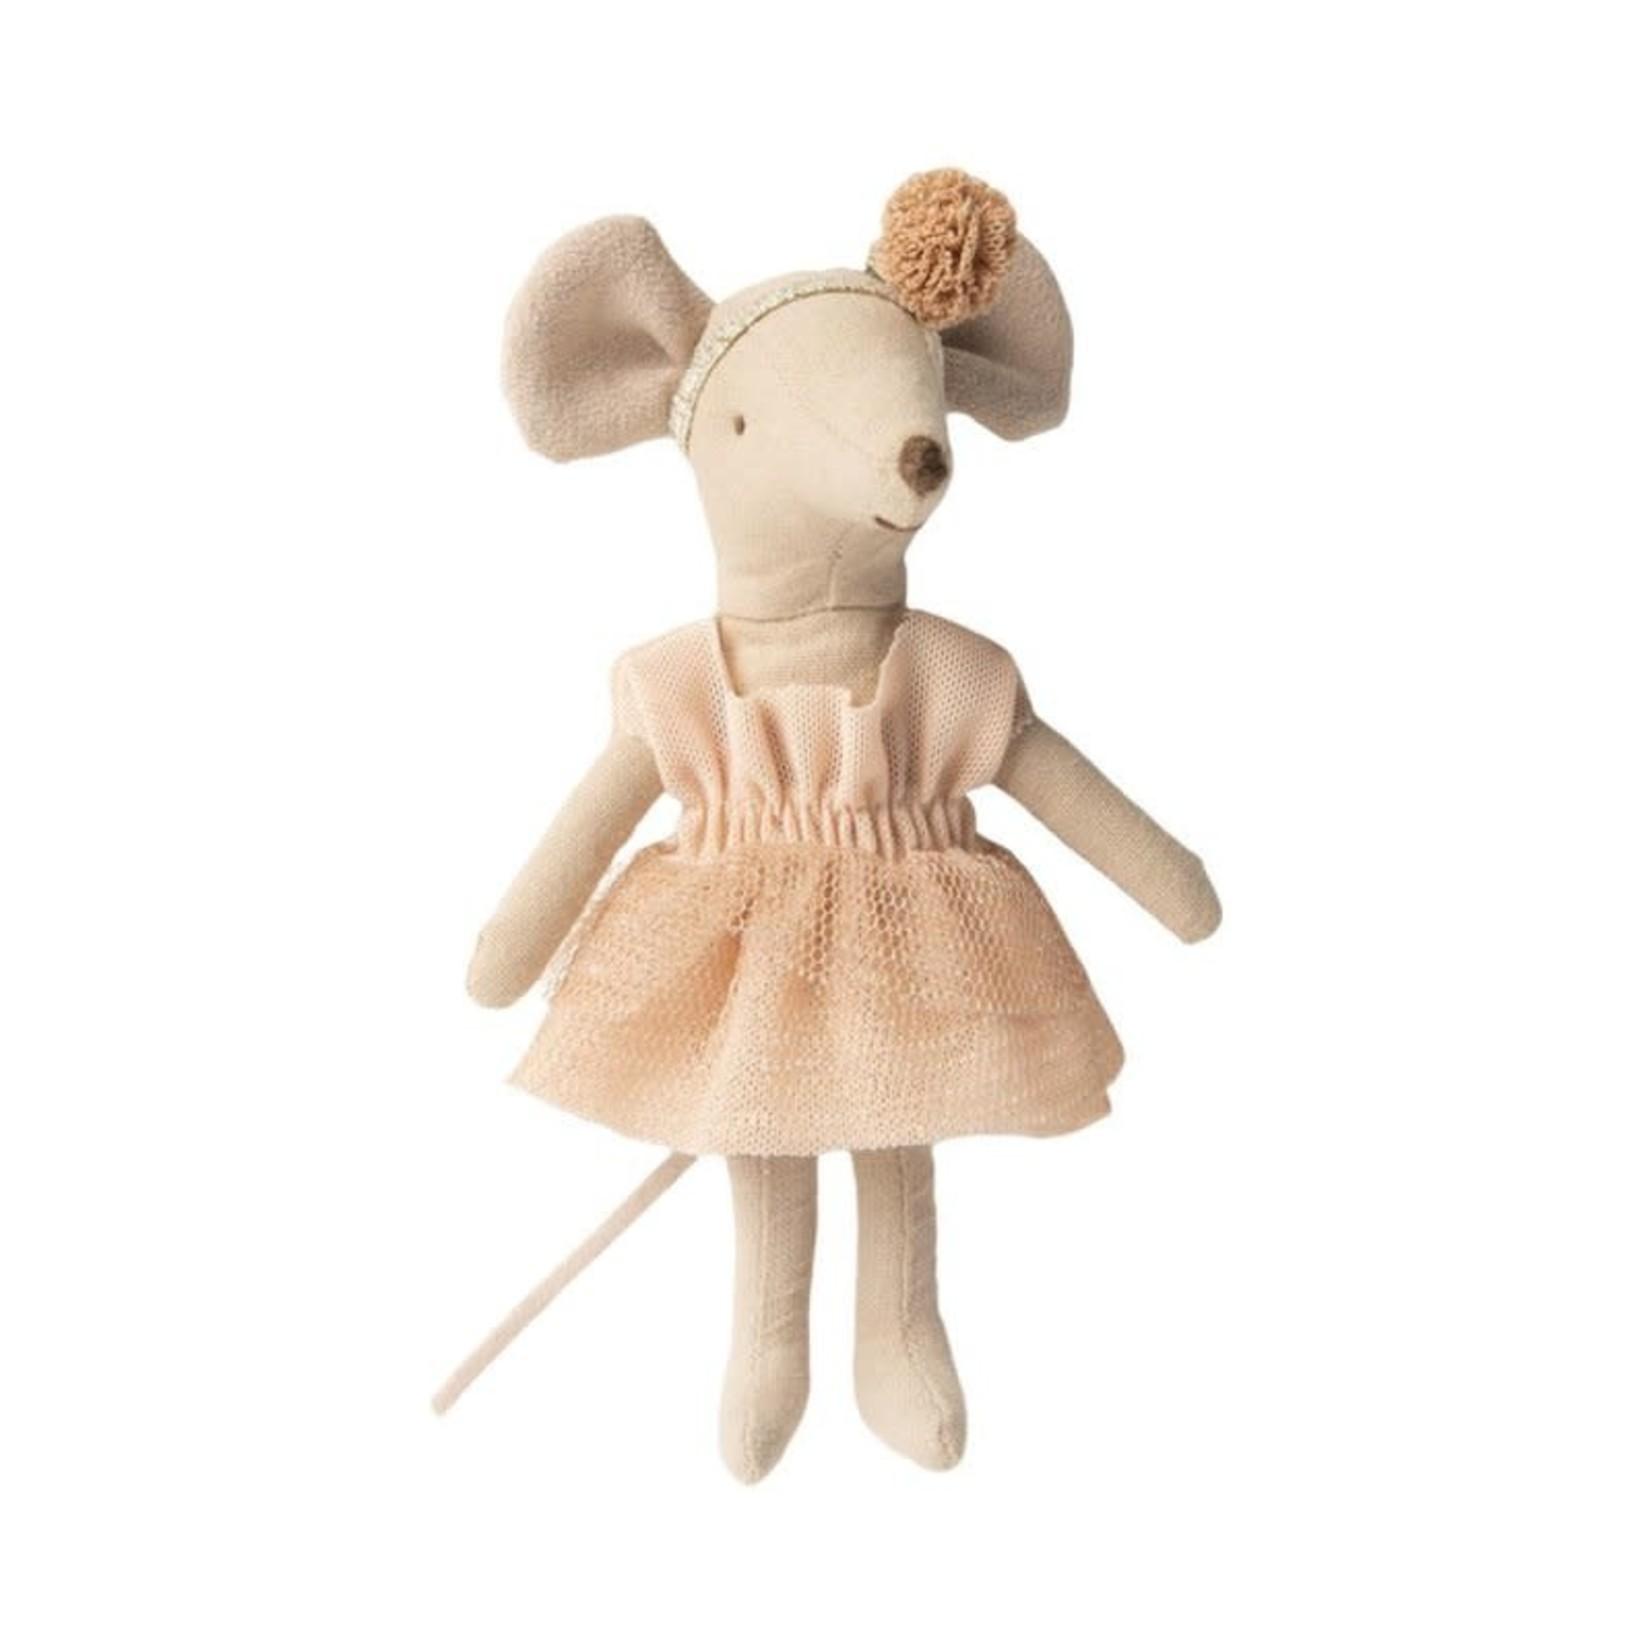 Maileg Dance Mouse Giselle - Maileg